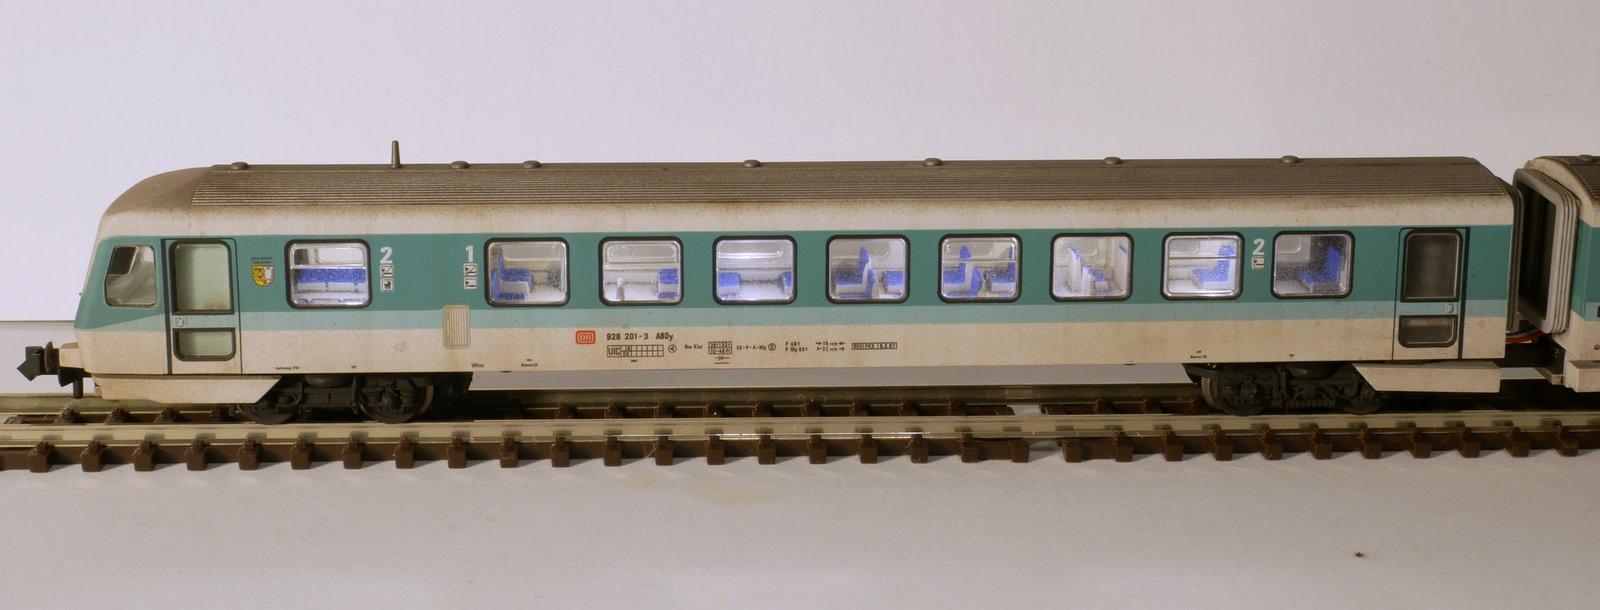 P1140795-001.JPG